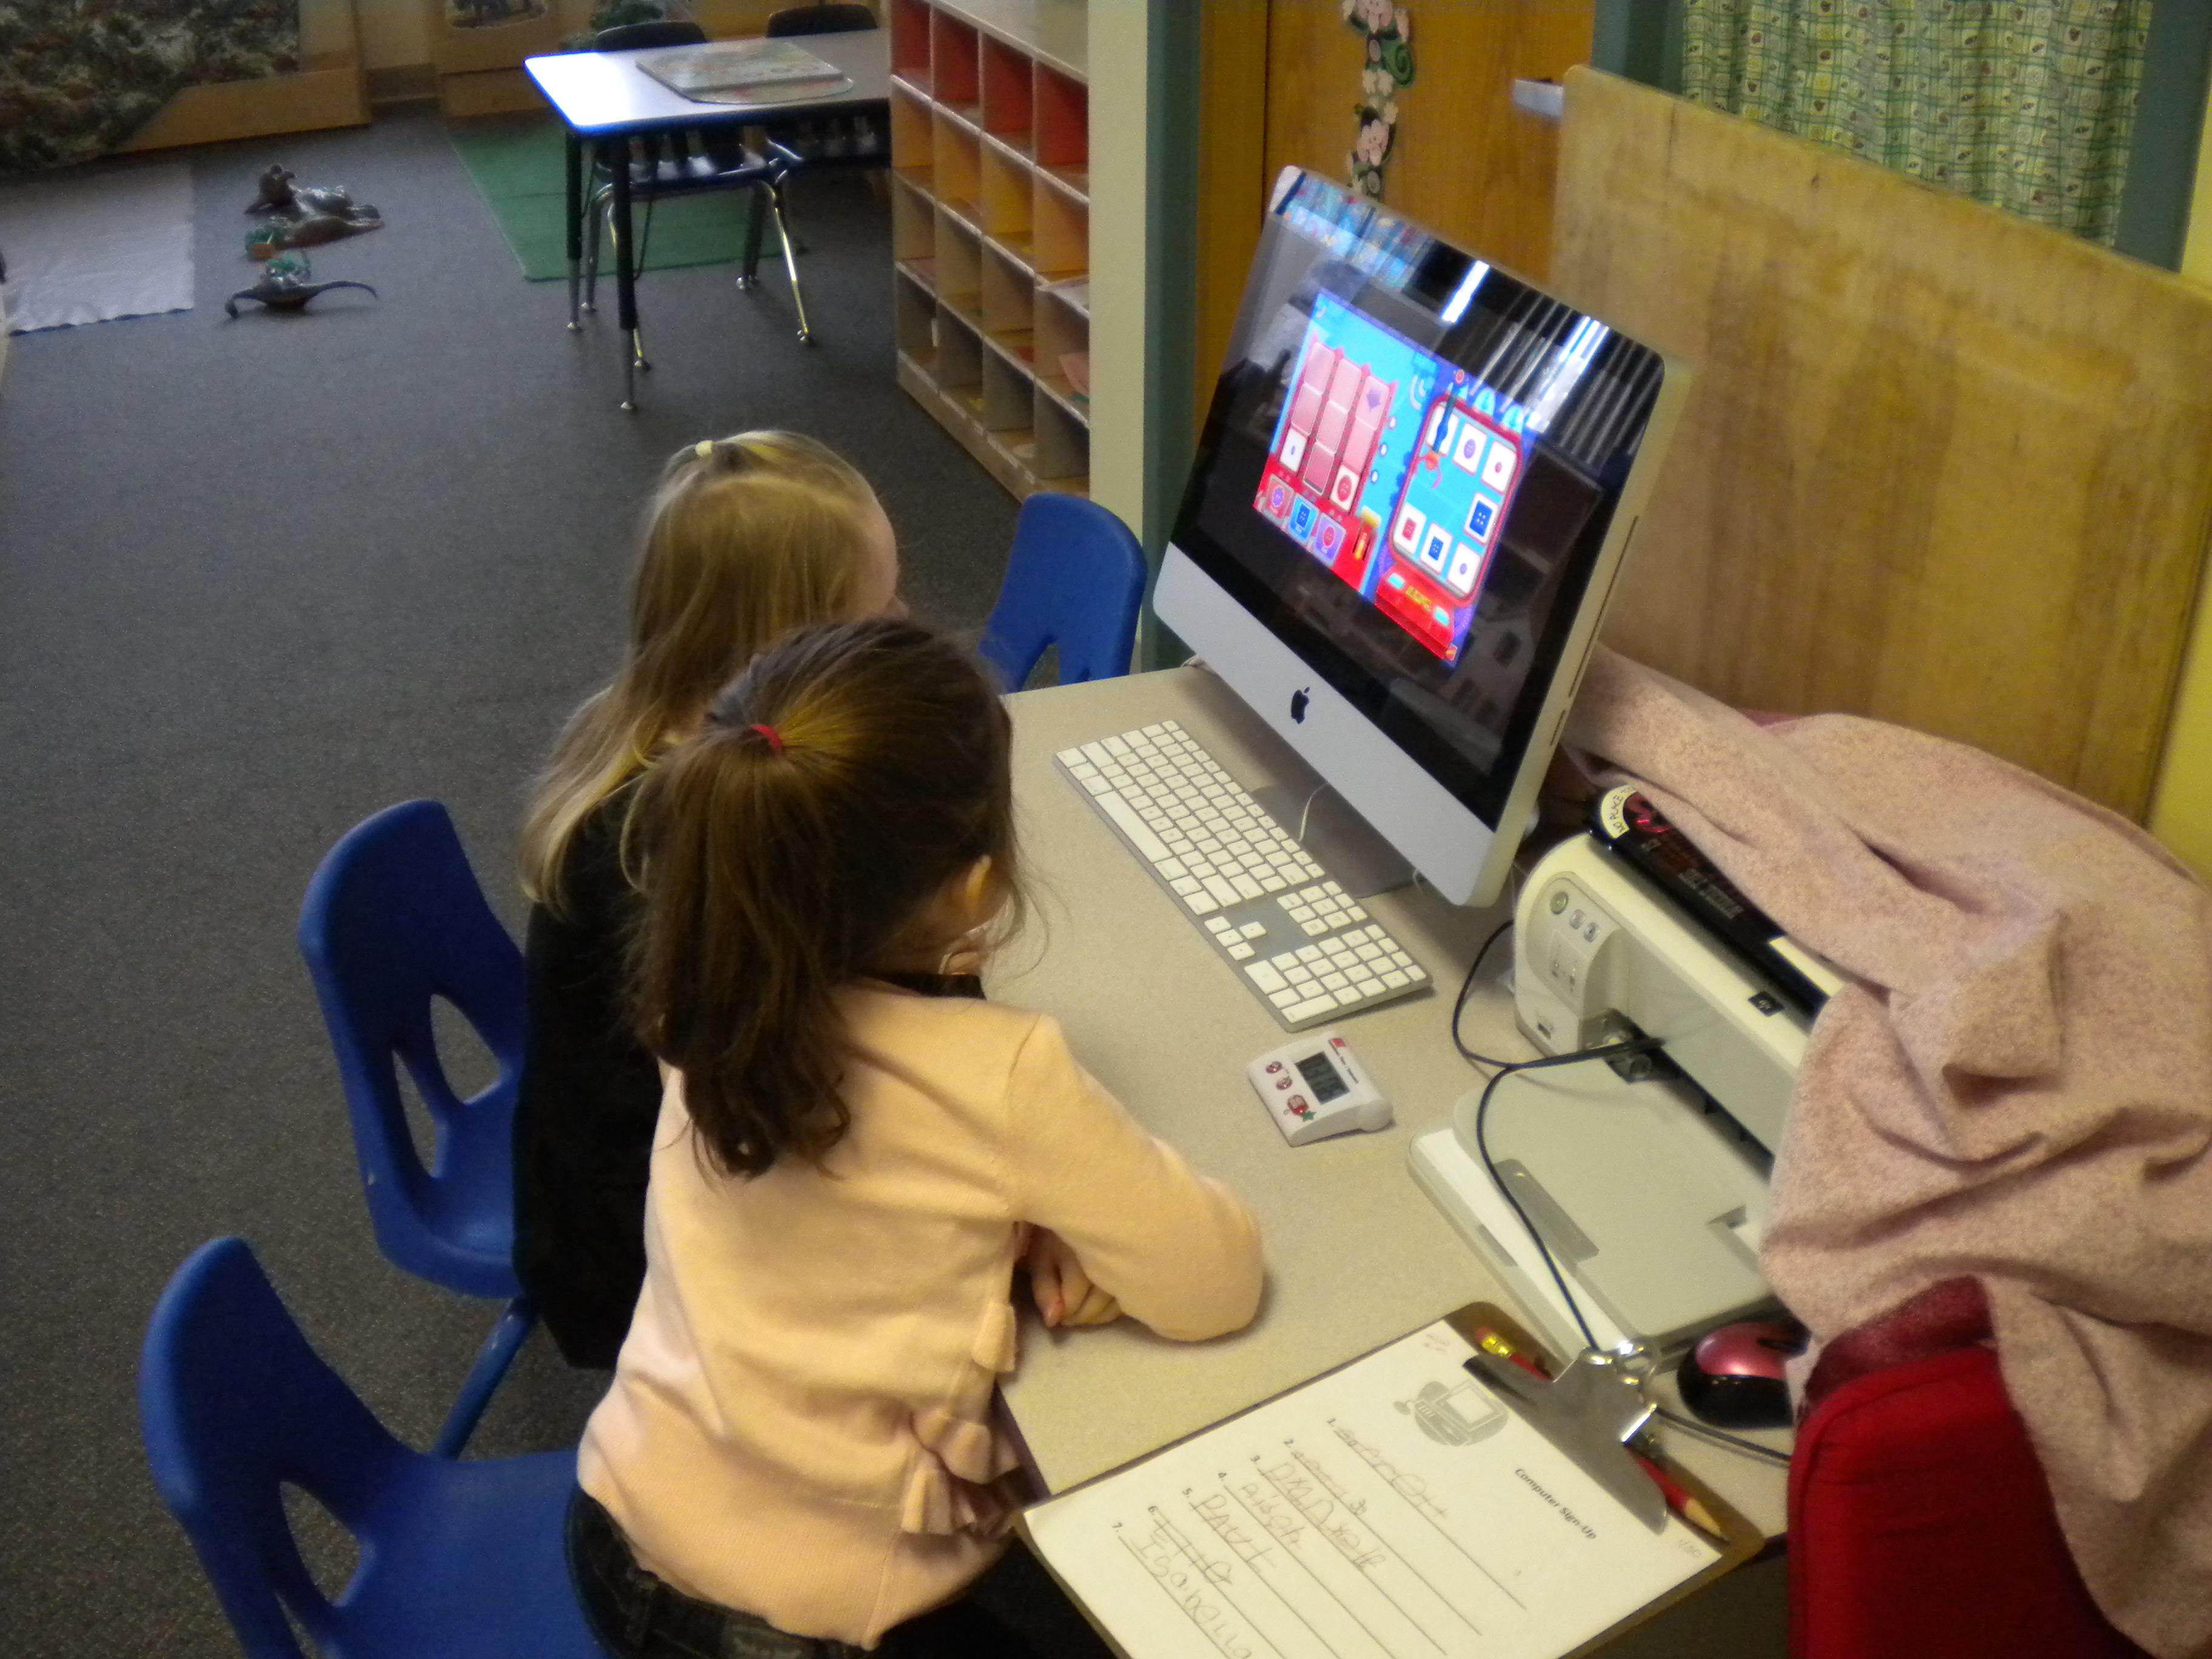 Kids And Computers In Preschool